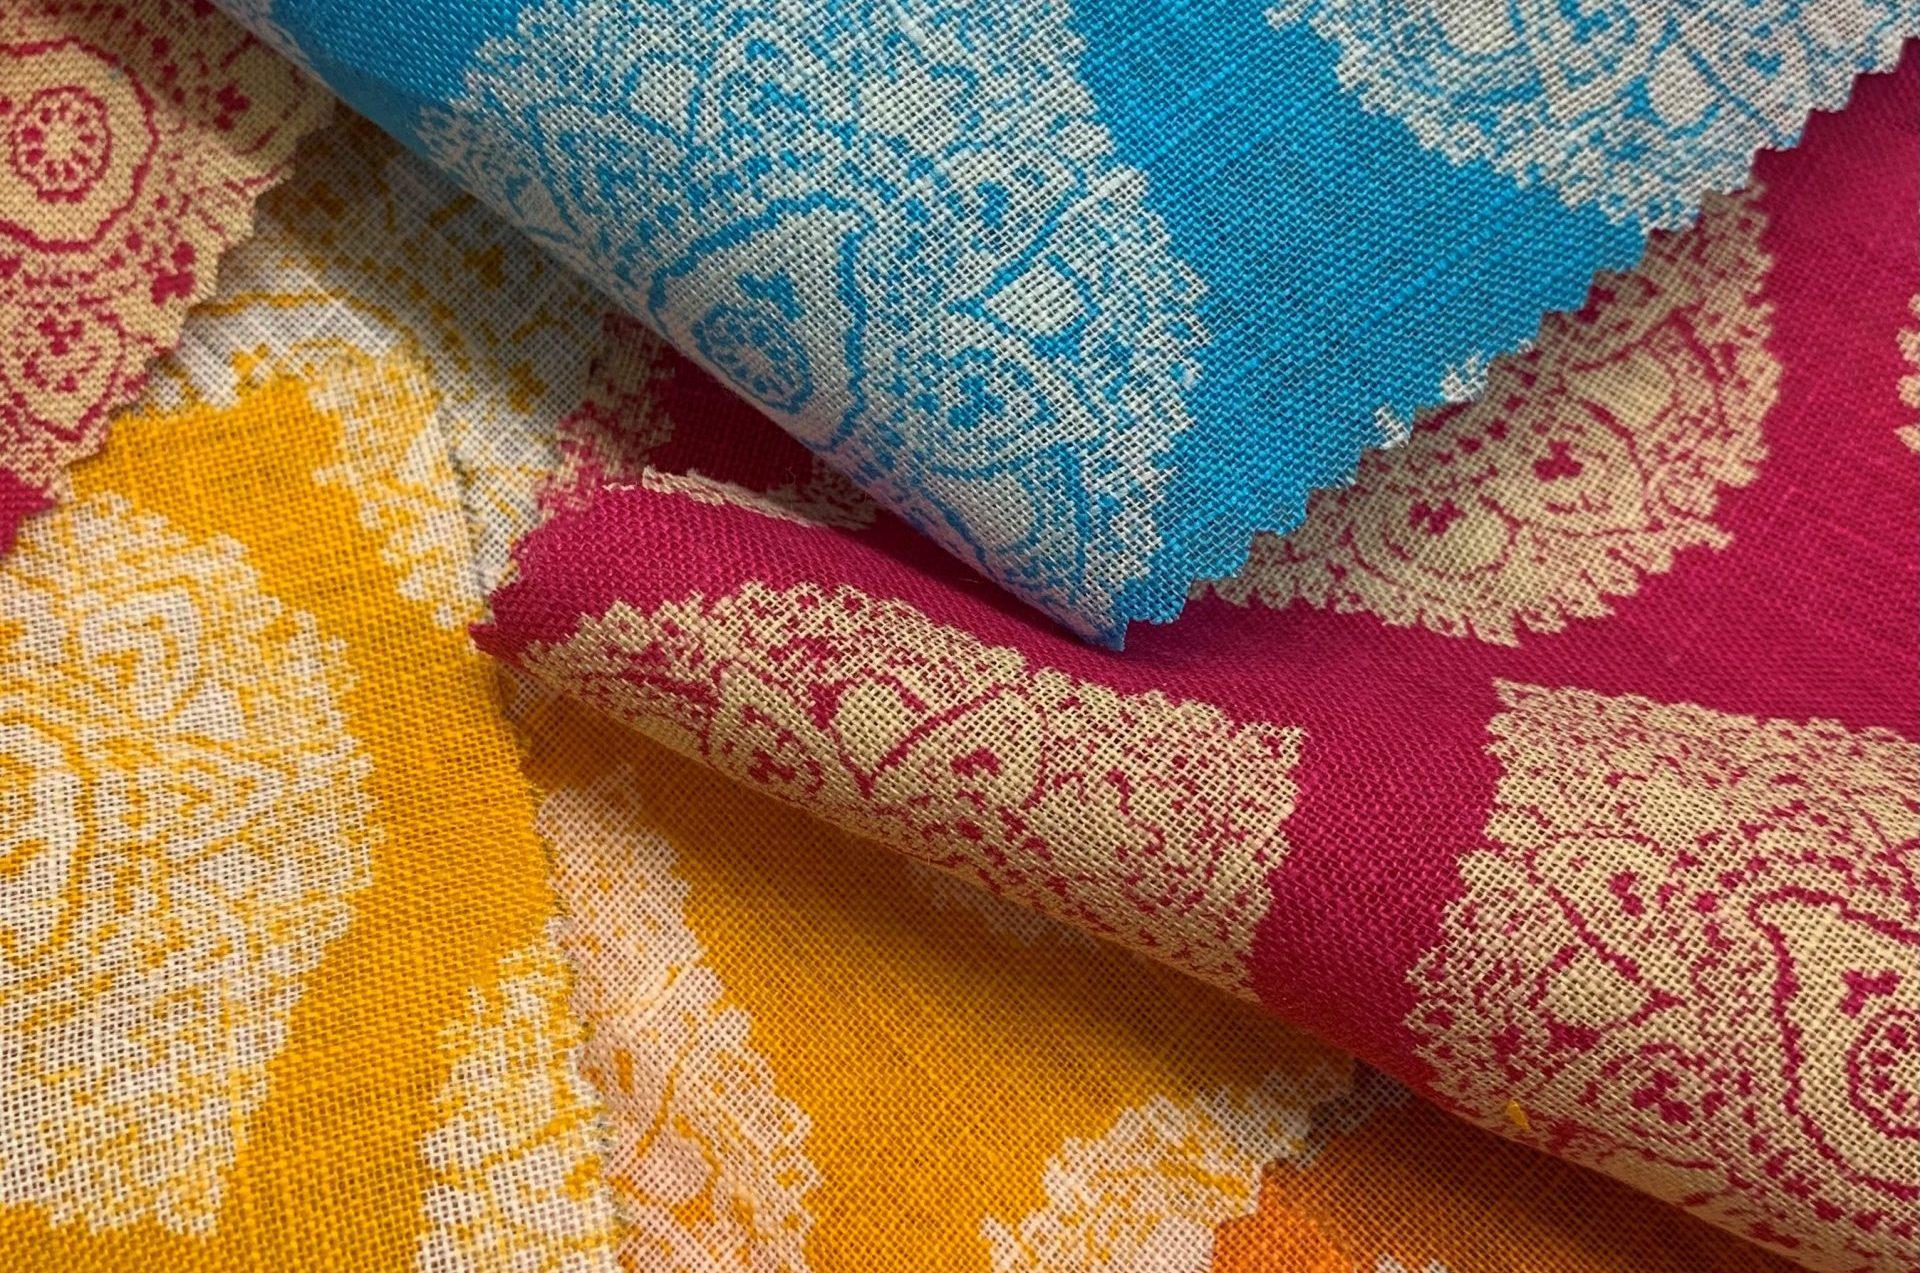 Irish linen, printed by hand in Macclesfield